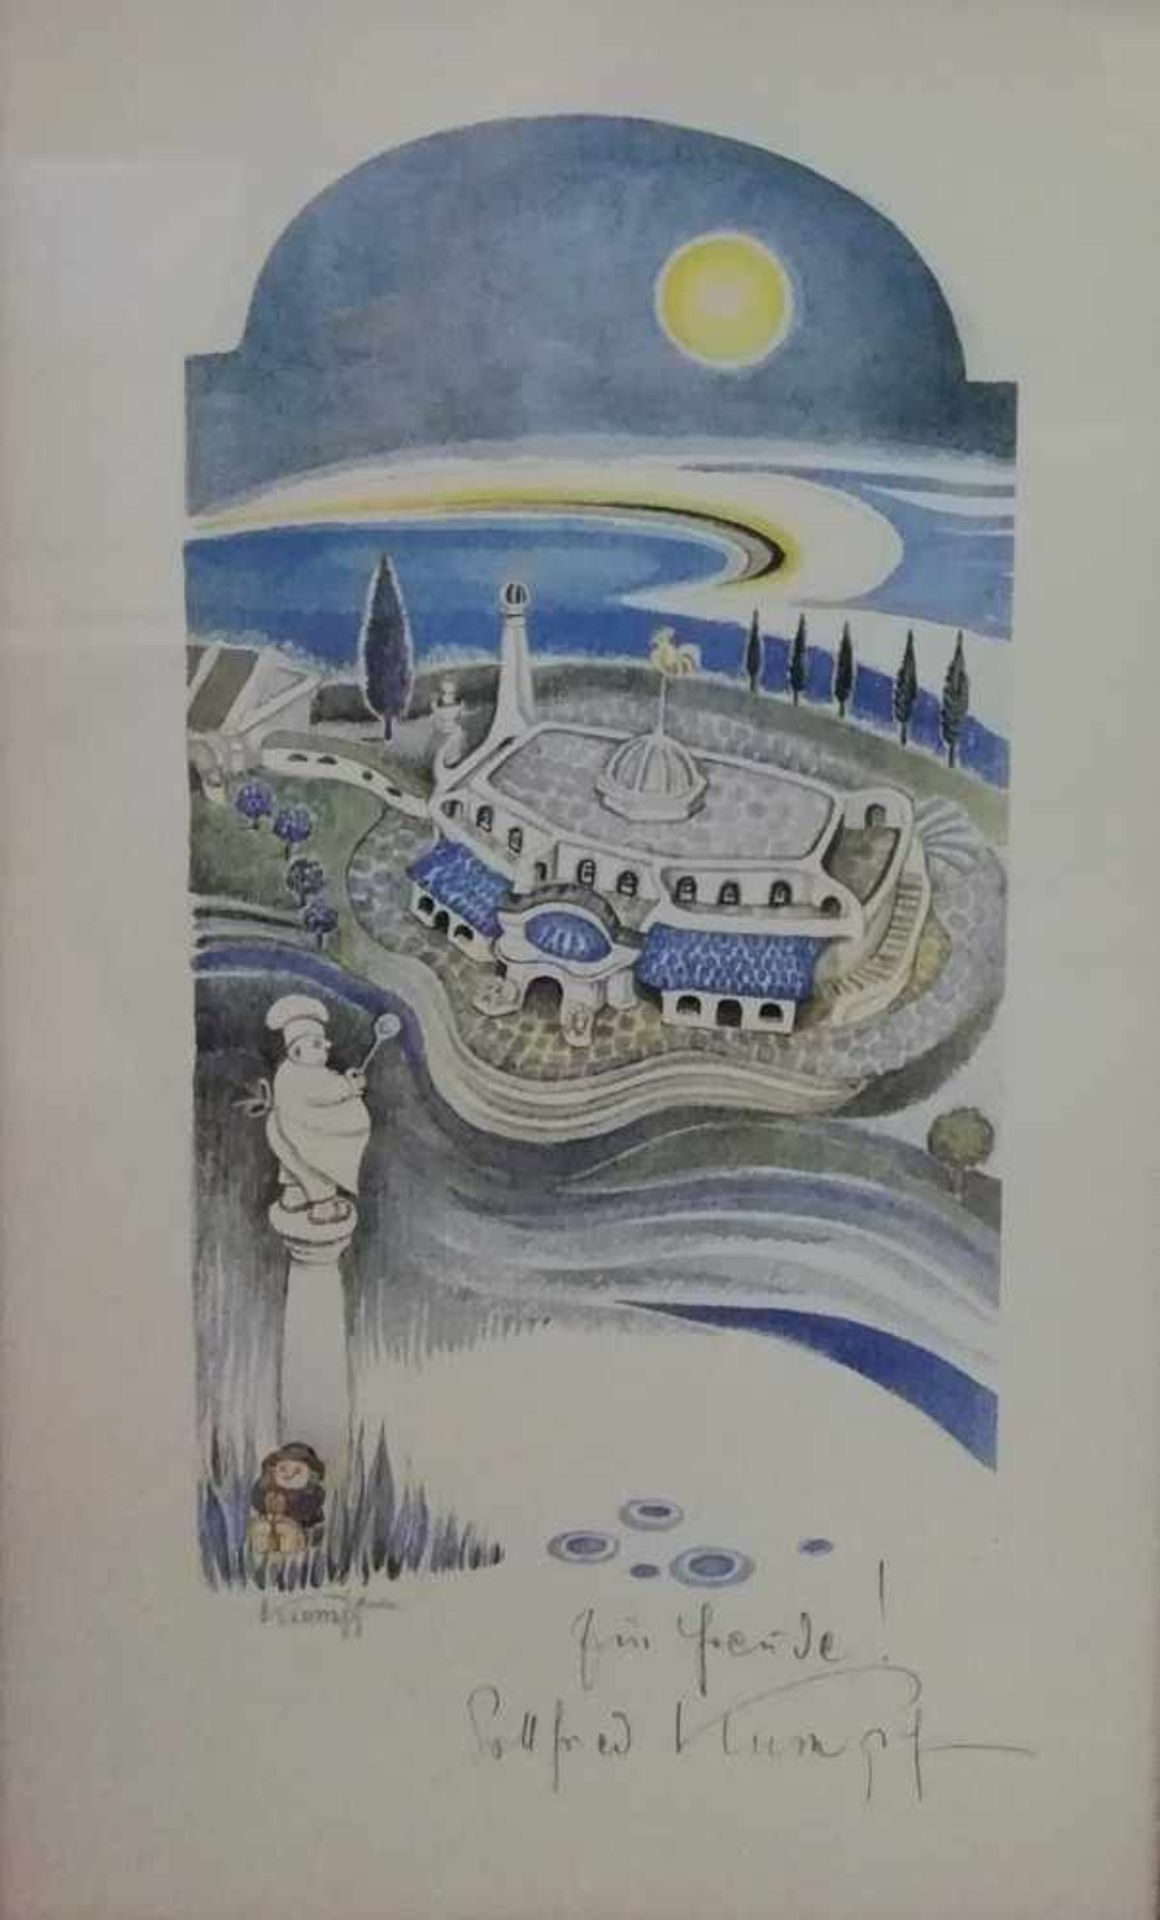 Los 21 - Gottfried Kumpf (Annaberg/Salzburg 1930 geb.)Raststätte Göttlesbrunn, Farbdruck, drucksigniert